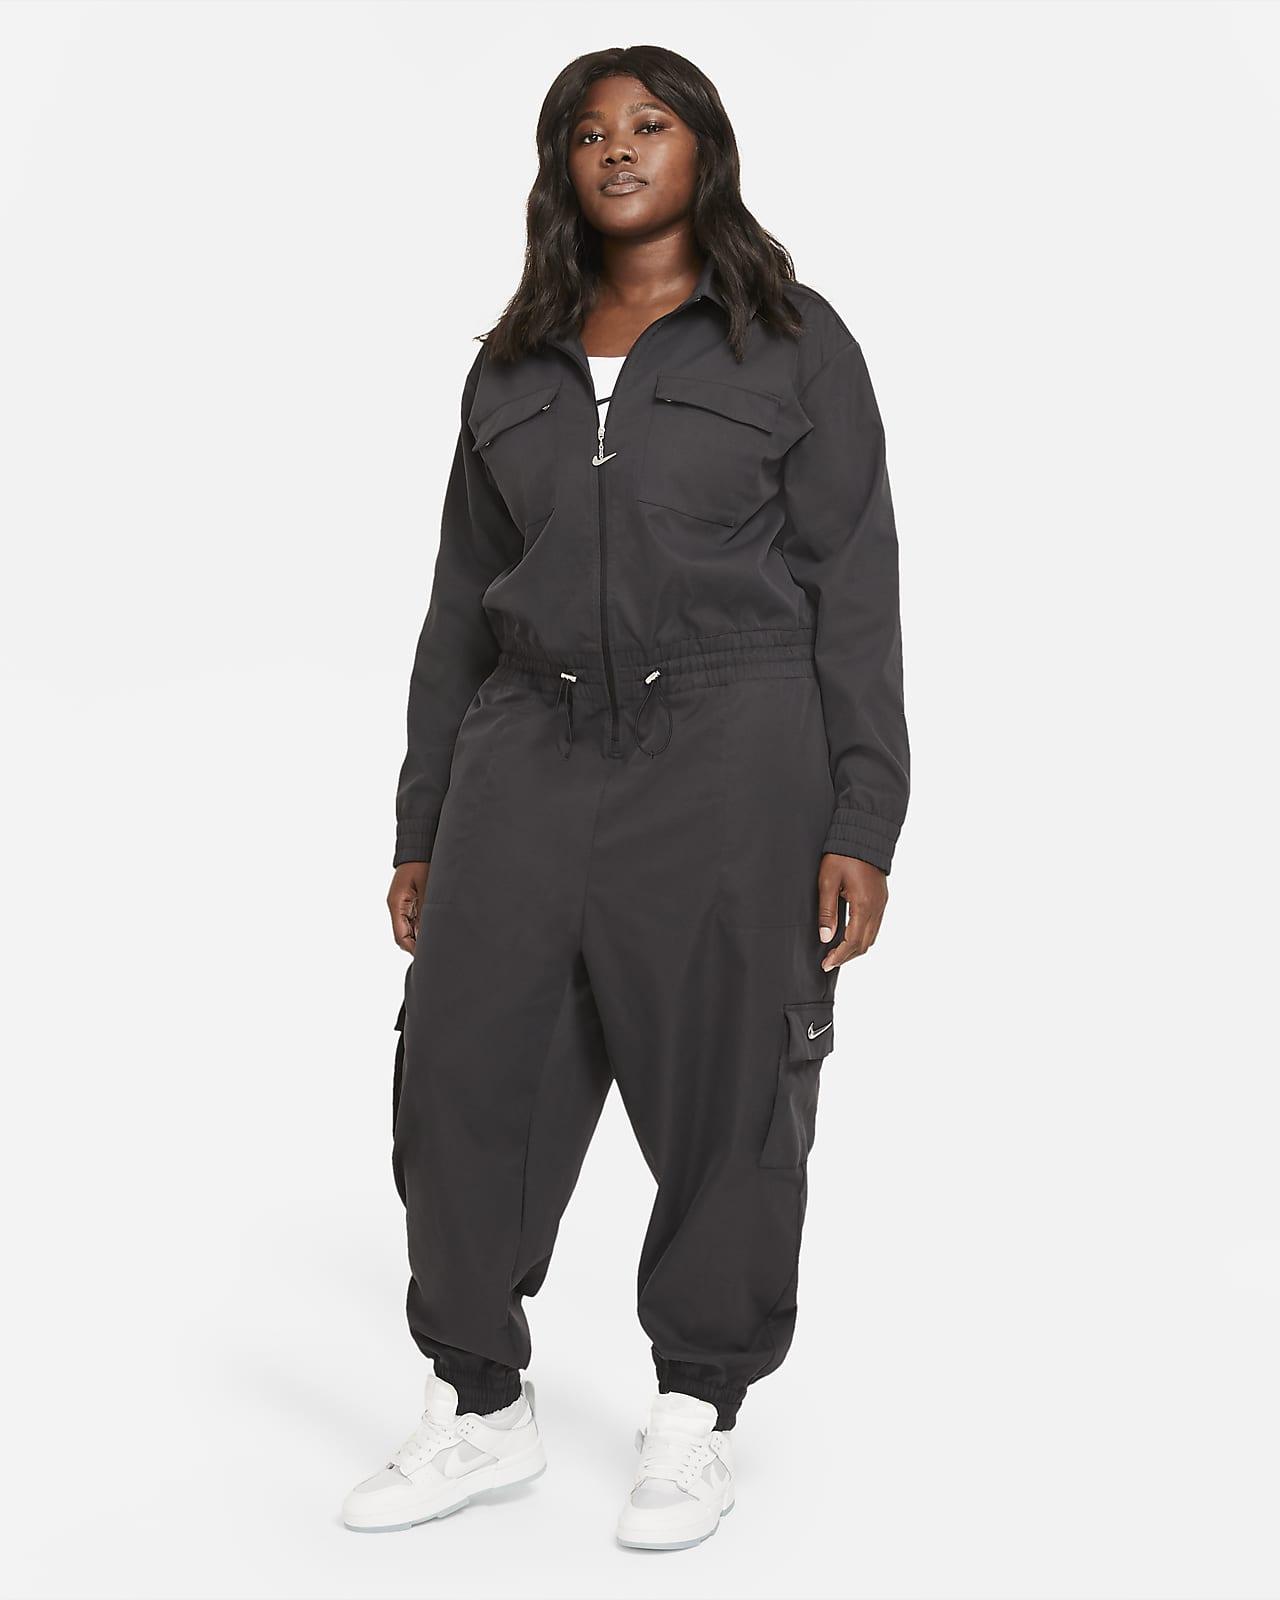 Combinaison Utility Nike Sportswear Swoosh pour Femme (grande taille)